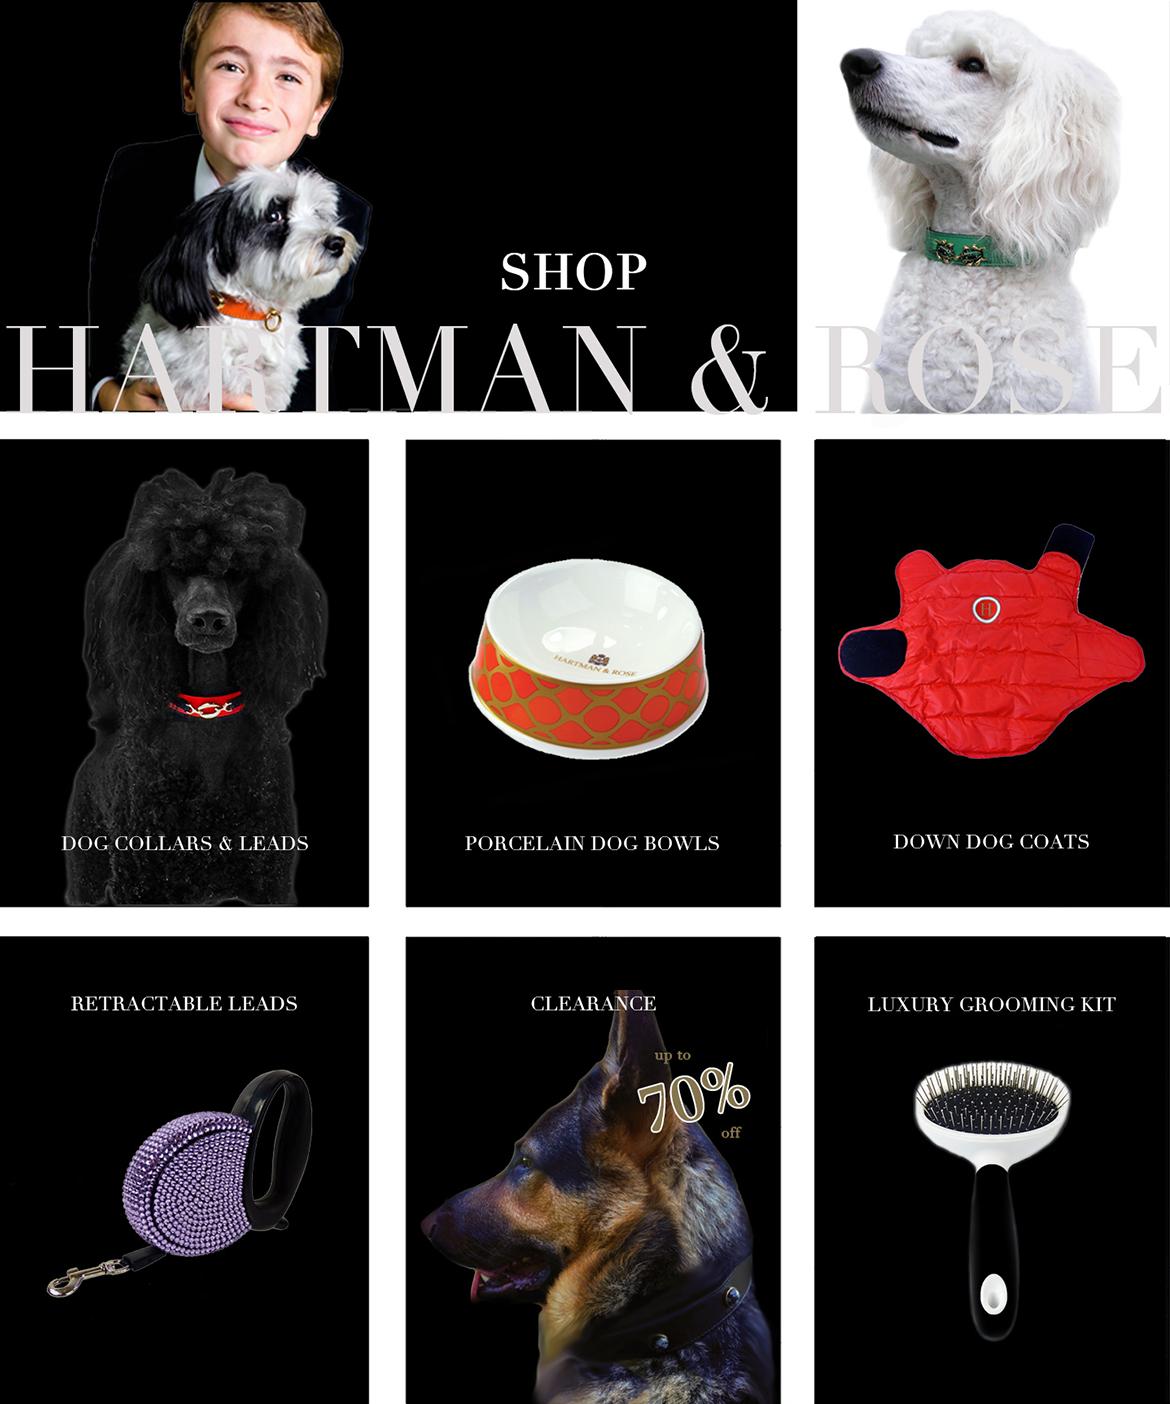 Hartman & Rose Shop